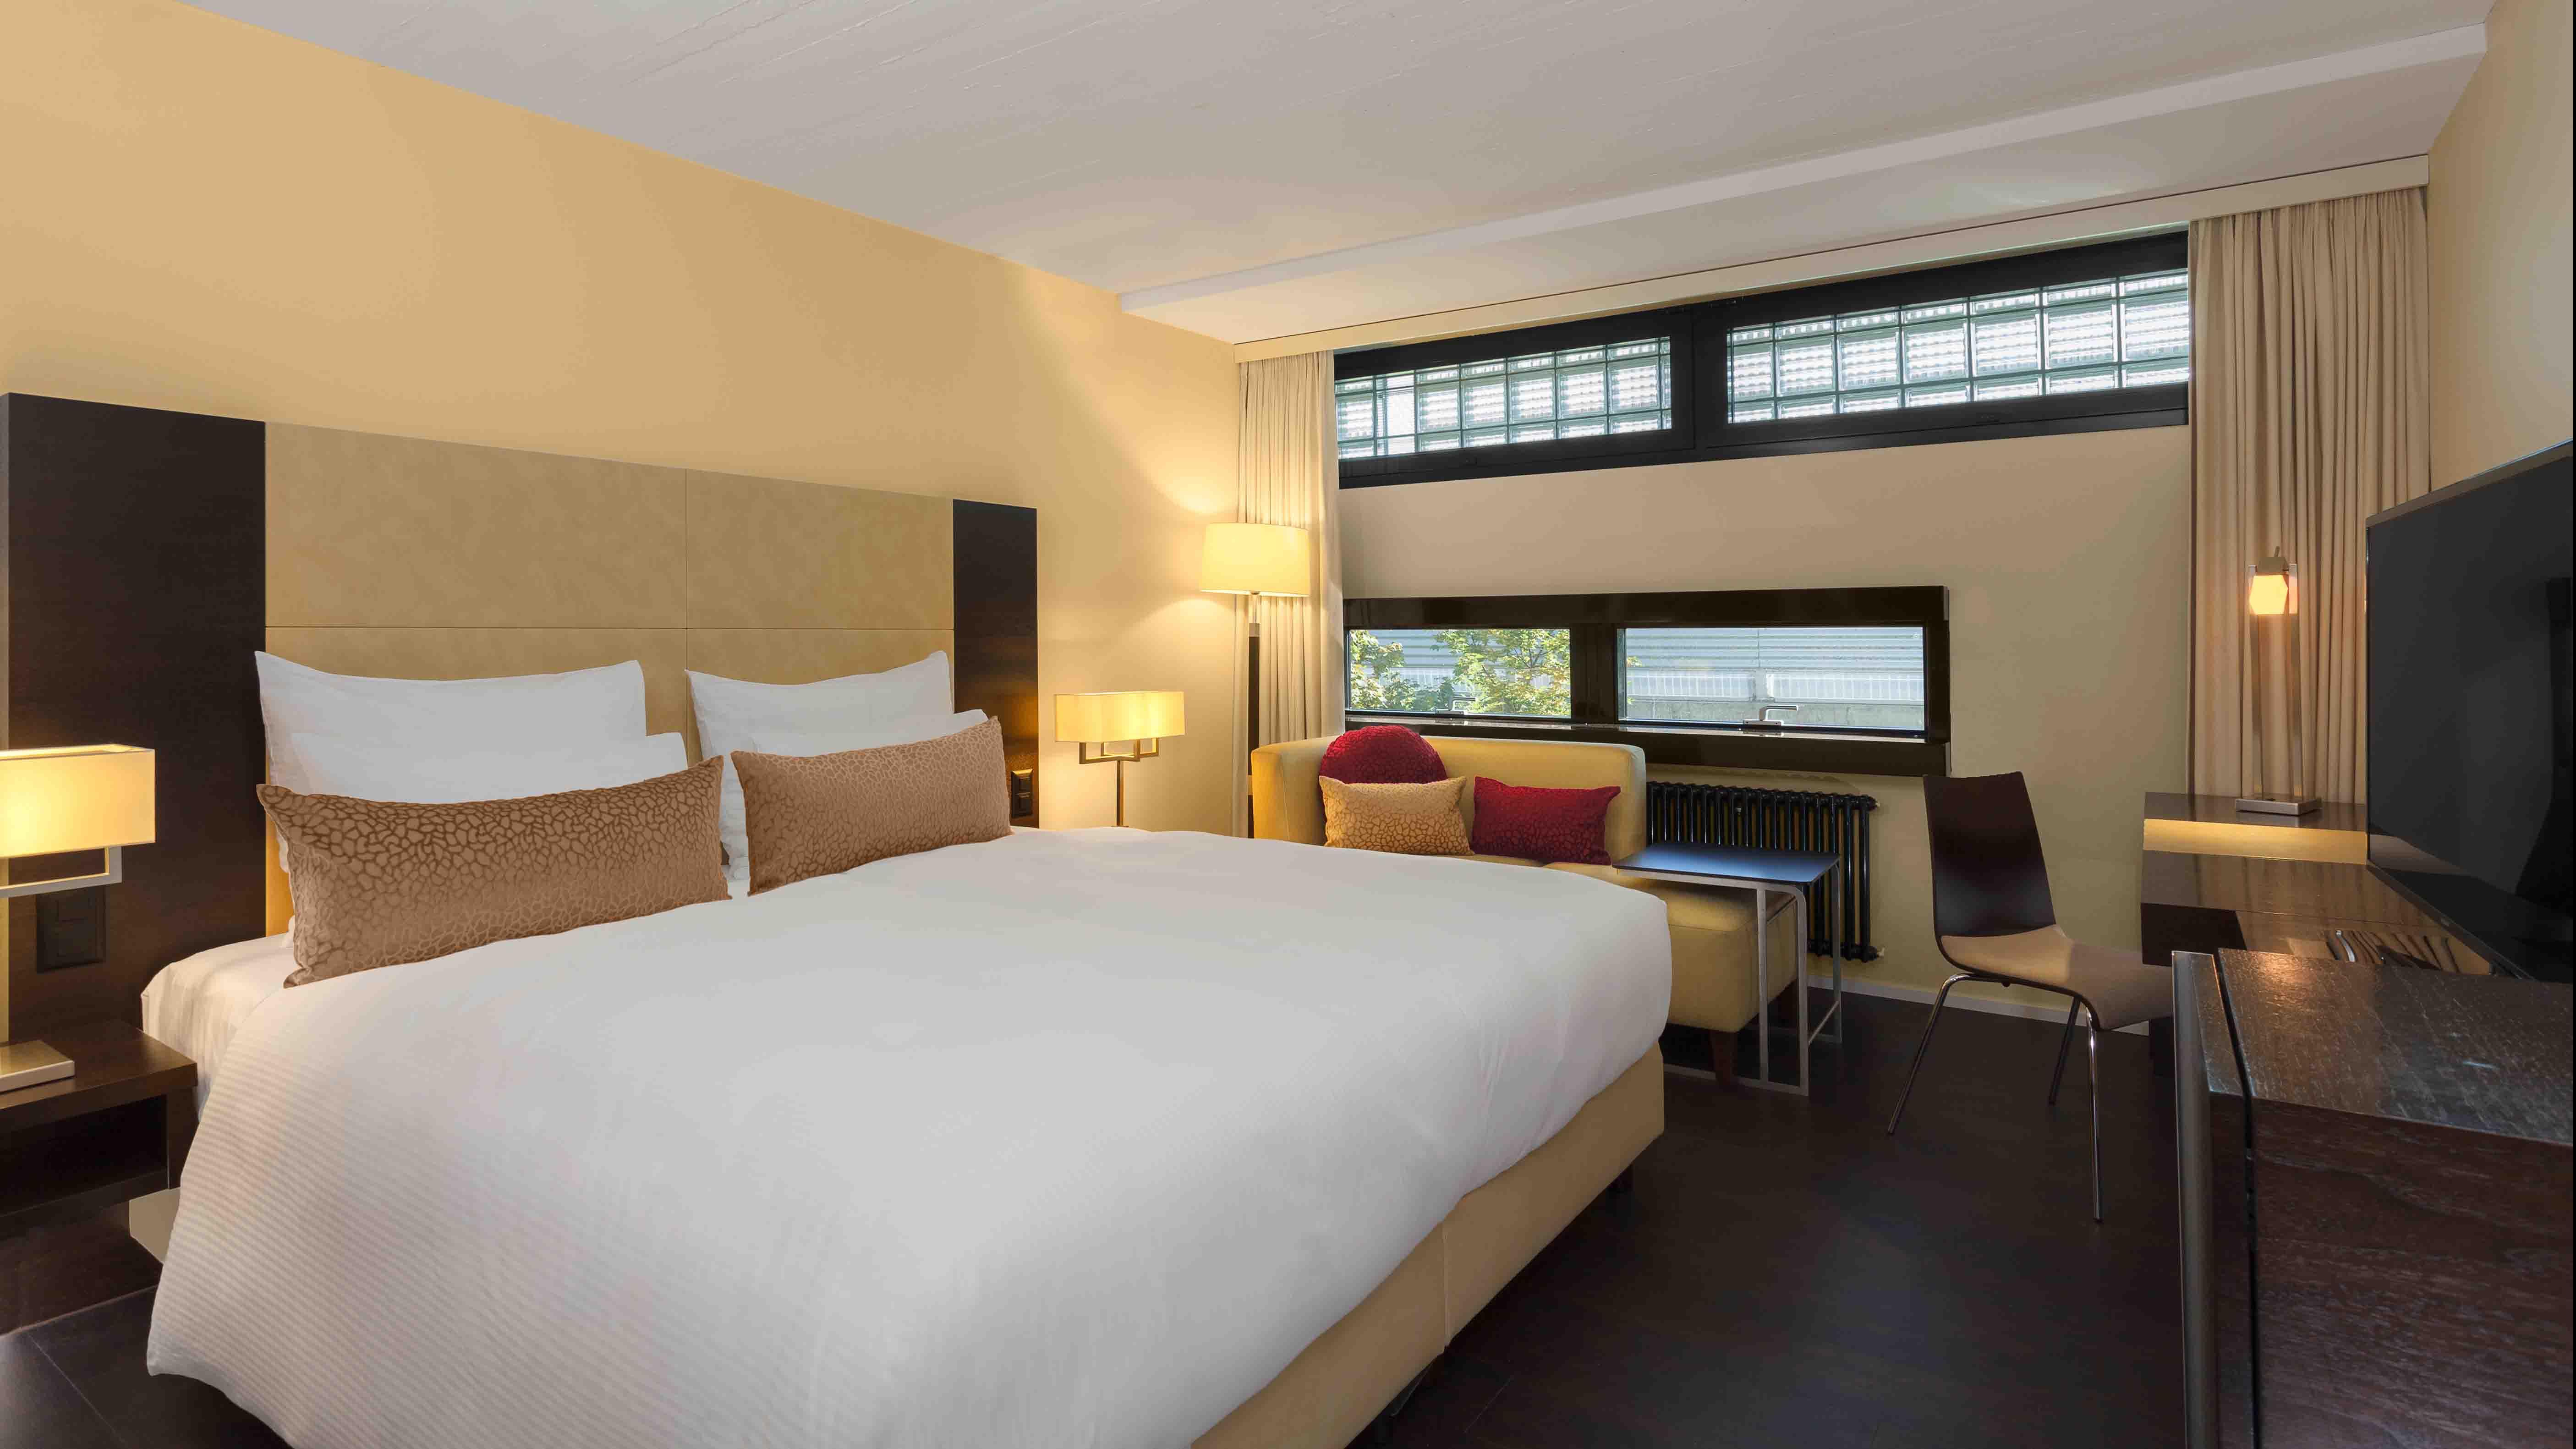 https://www.hotelsbyday.com/_data/default-hotel_image/2/12988/deluxe-bed-room.jpg